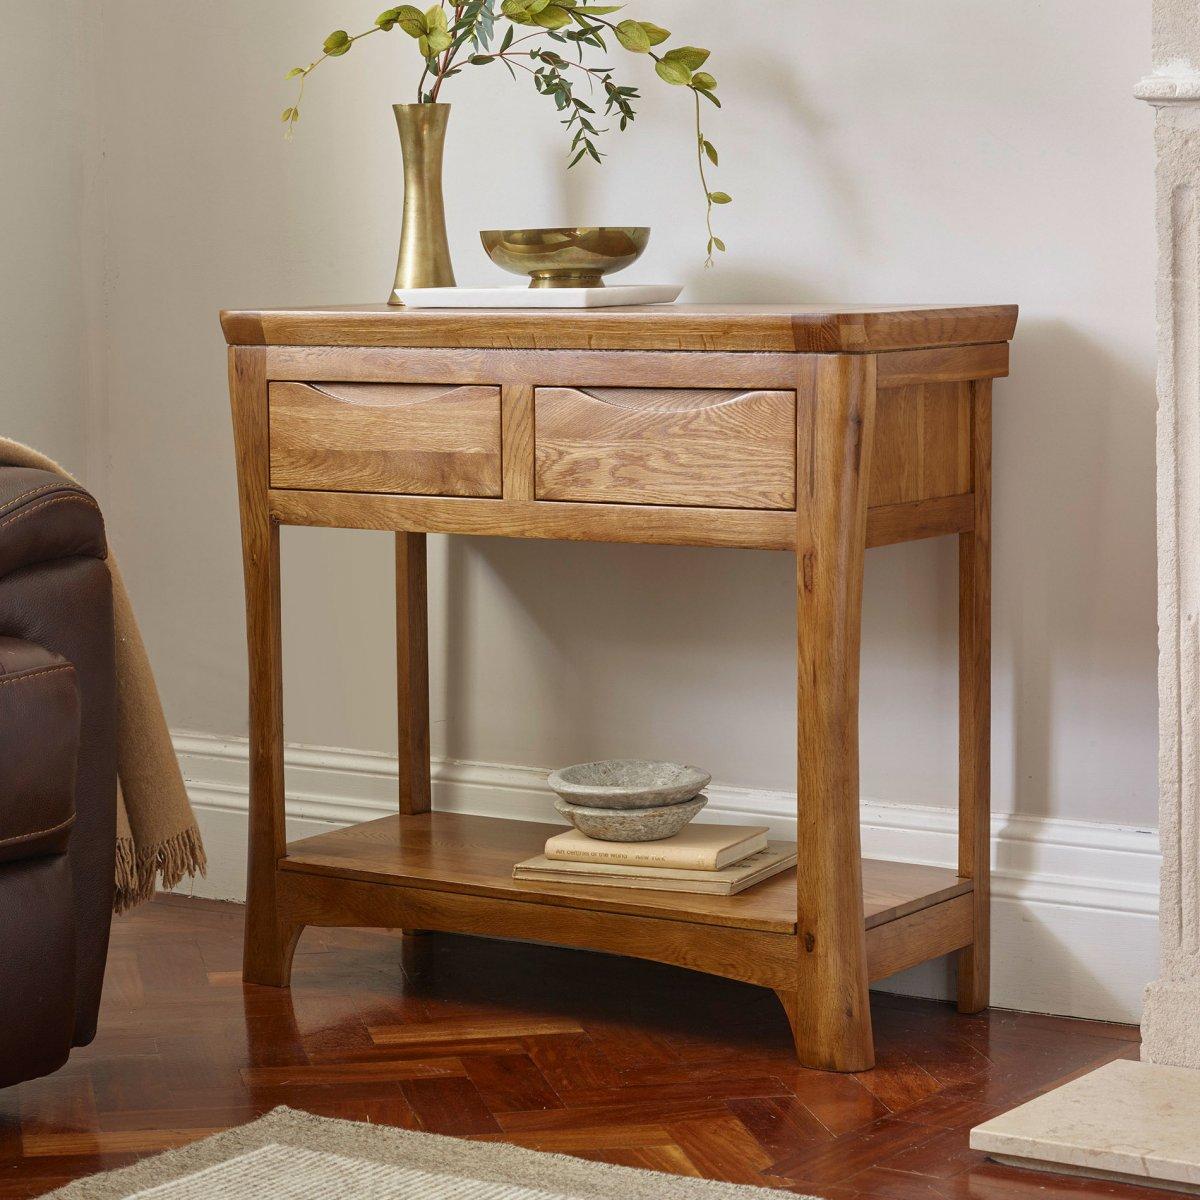 Orrick Console Table In Rustic Solid Oak Oak Furniture Land